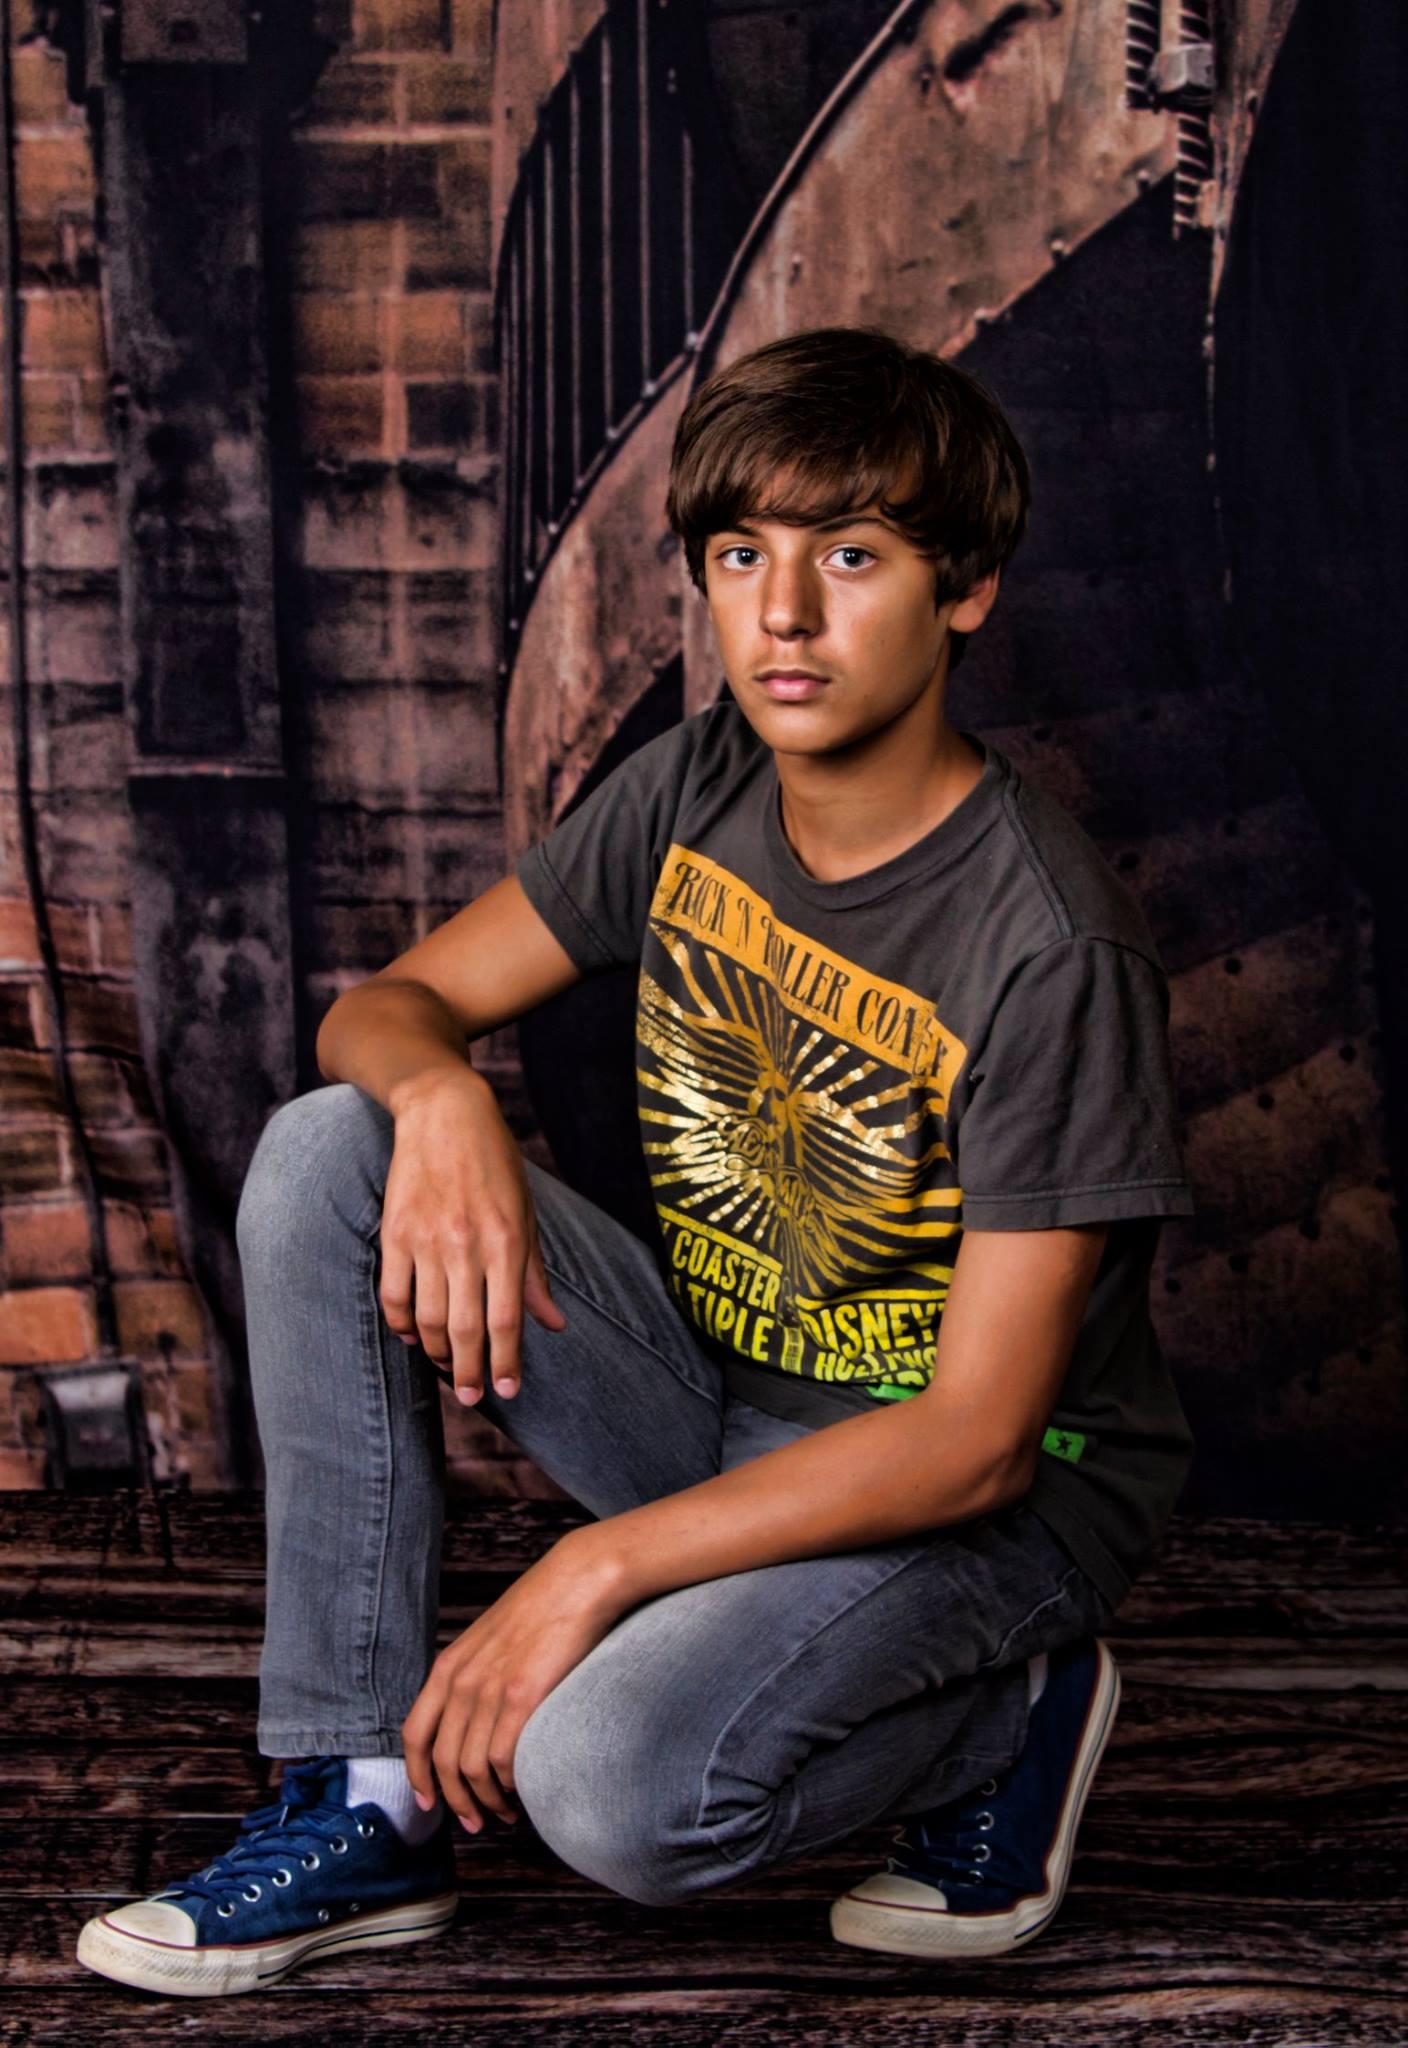 General photo of Matthew Davey